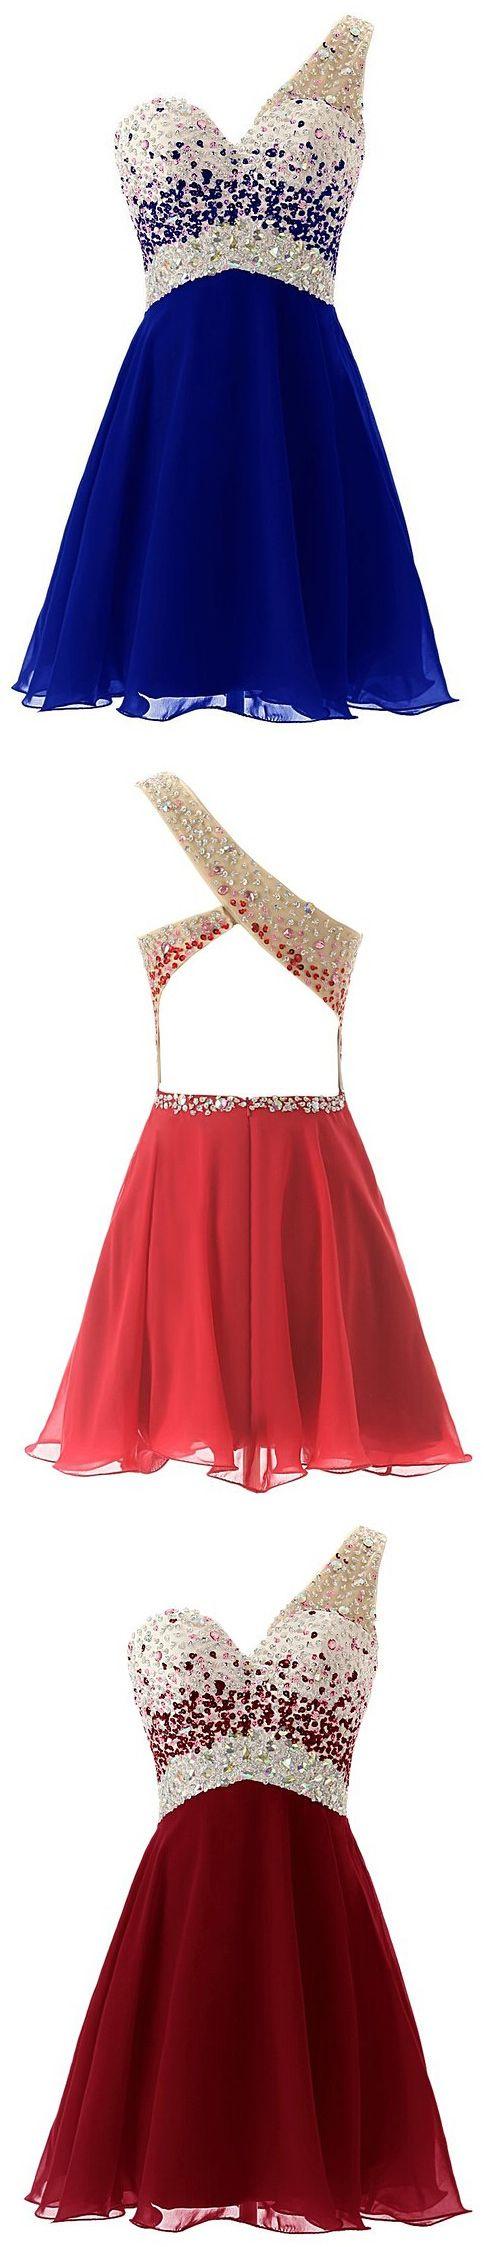 royal blue homecoming dresses, red homecoming dresses, burgundy homecoming…